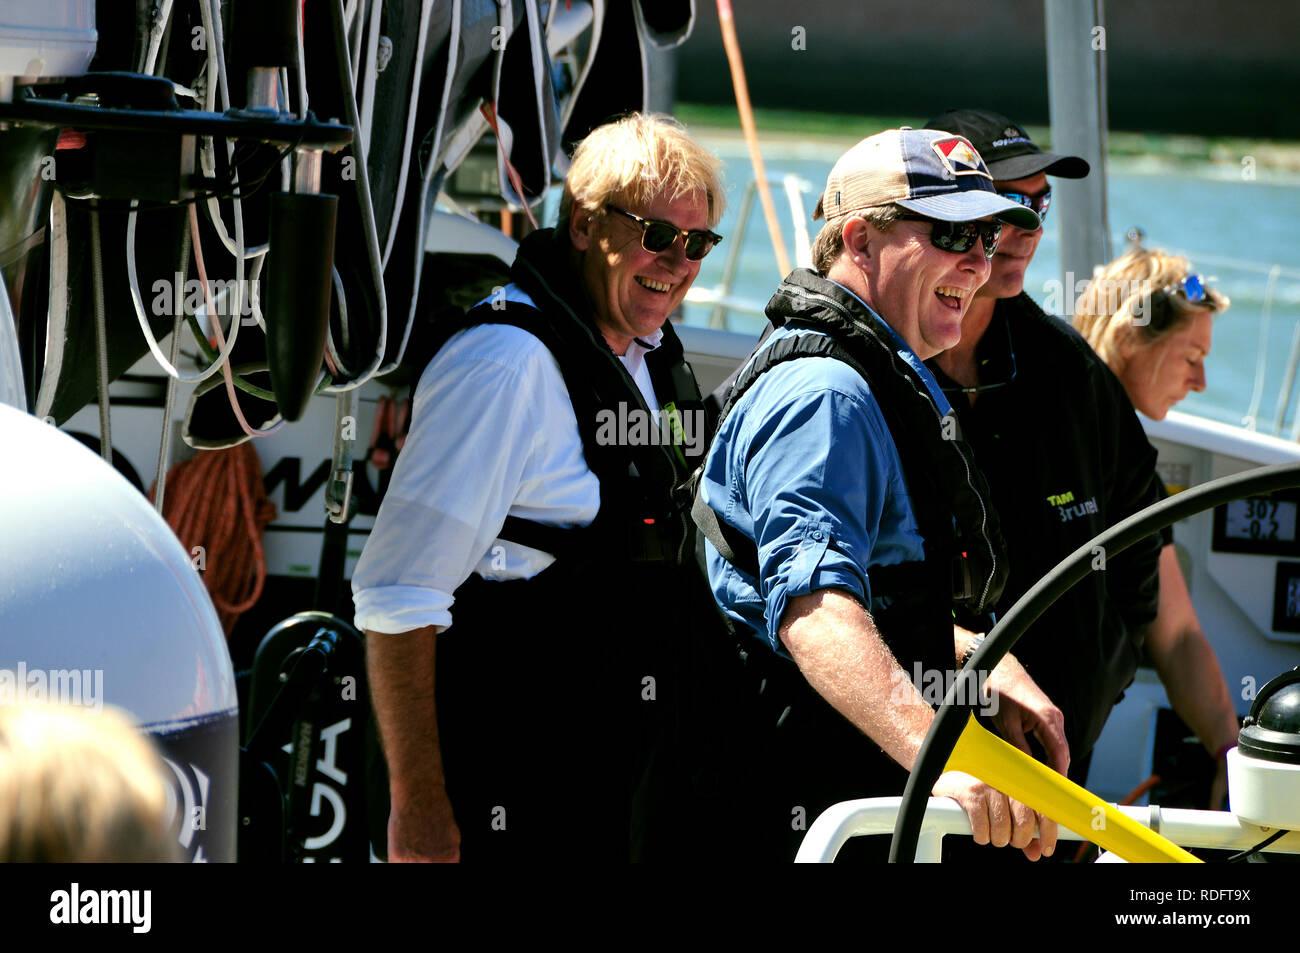 King Willem-Alexander visits the 'Volvo Ocean Race 2017-2018 village' in Scheveningen Harbour, The Hague, The Netherlands. Friday 29th June, 2018. H.R - Stock Image